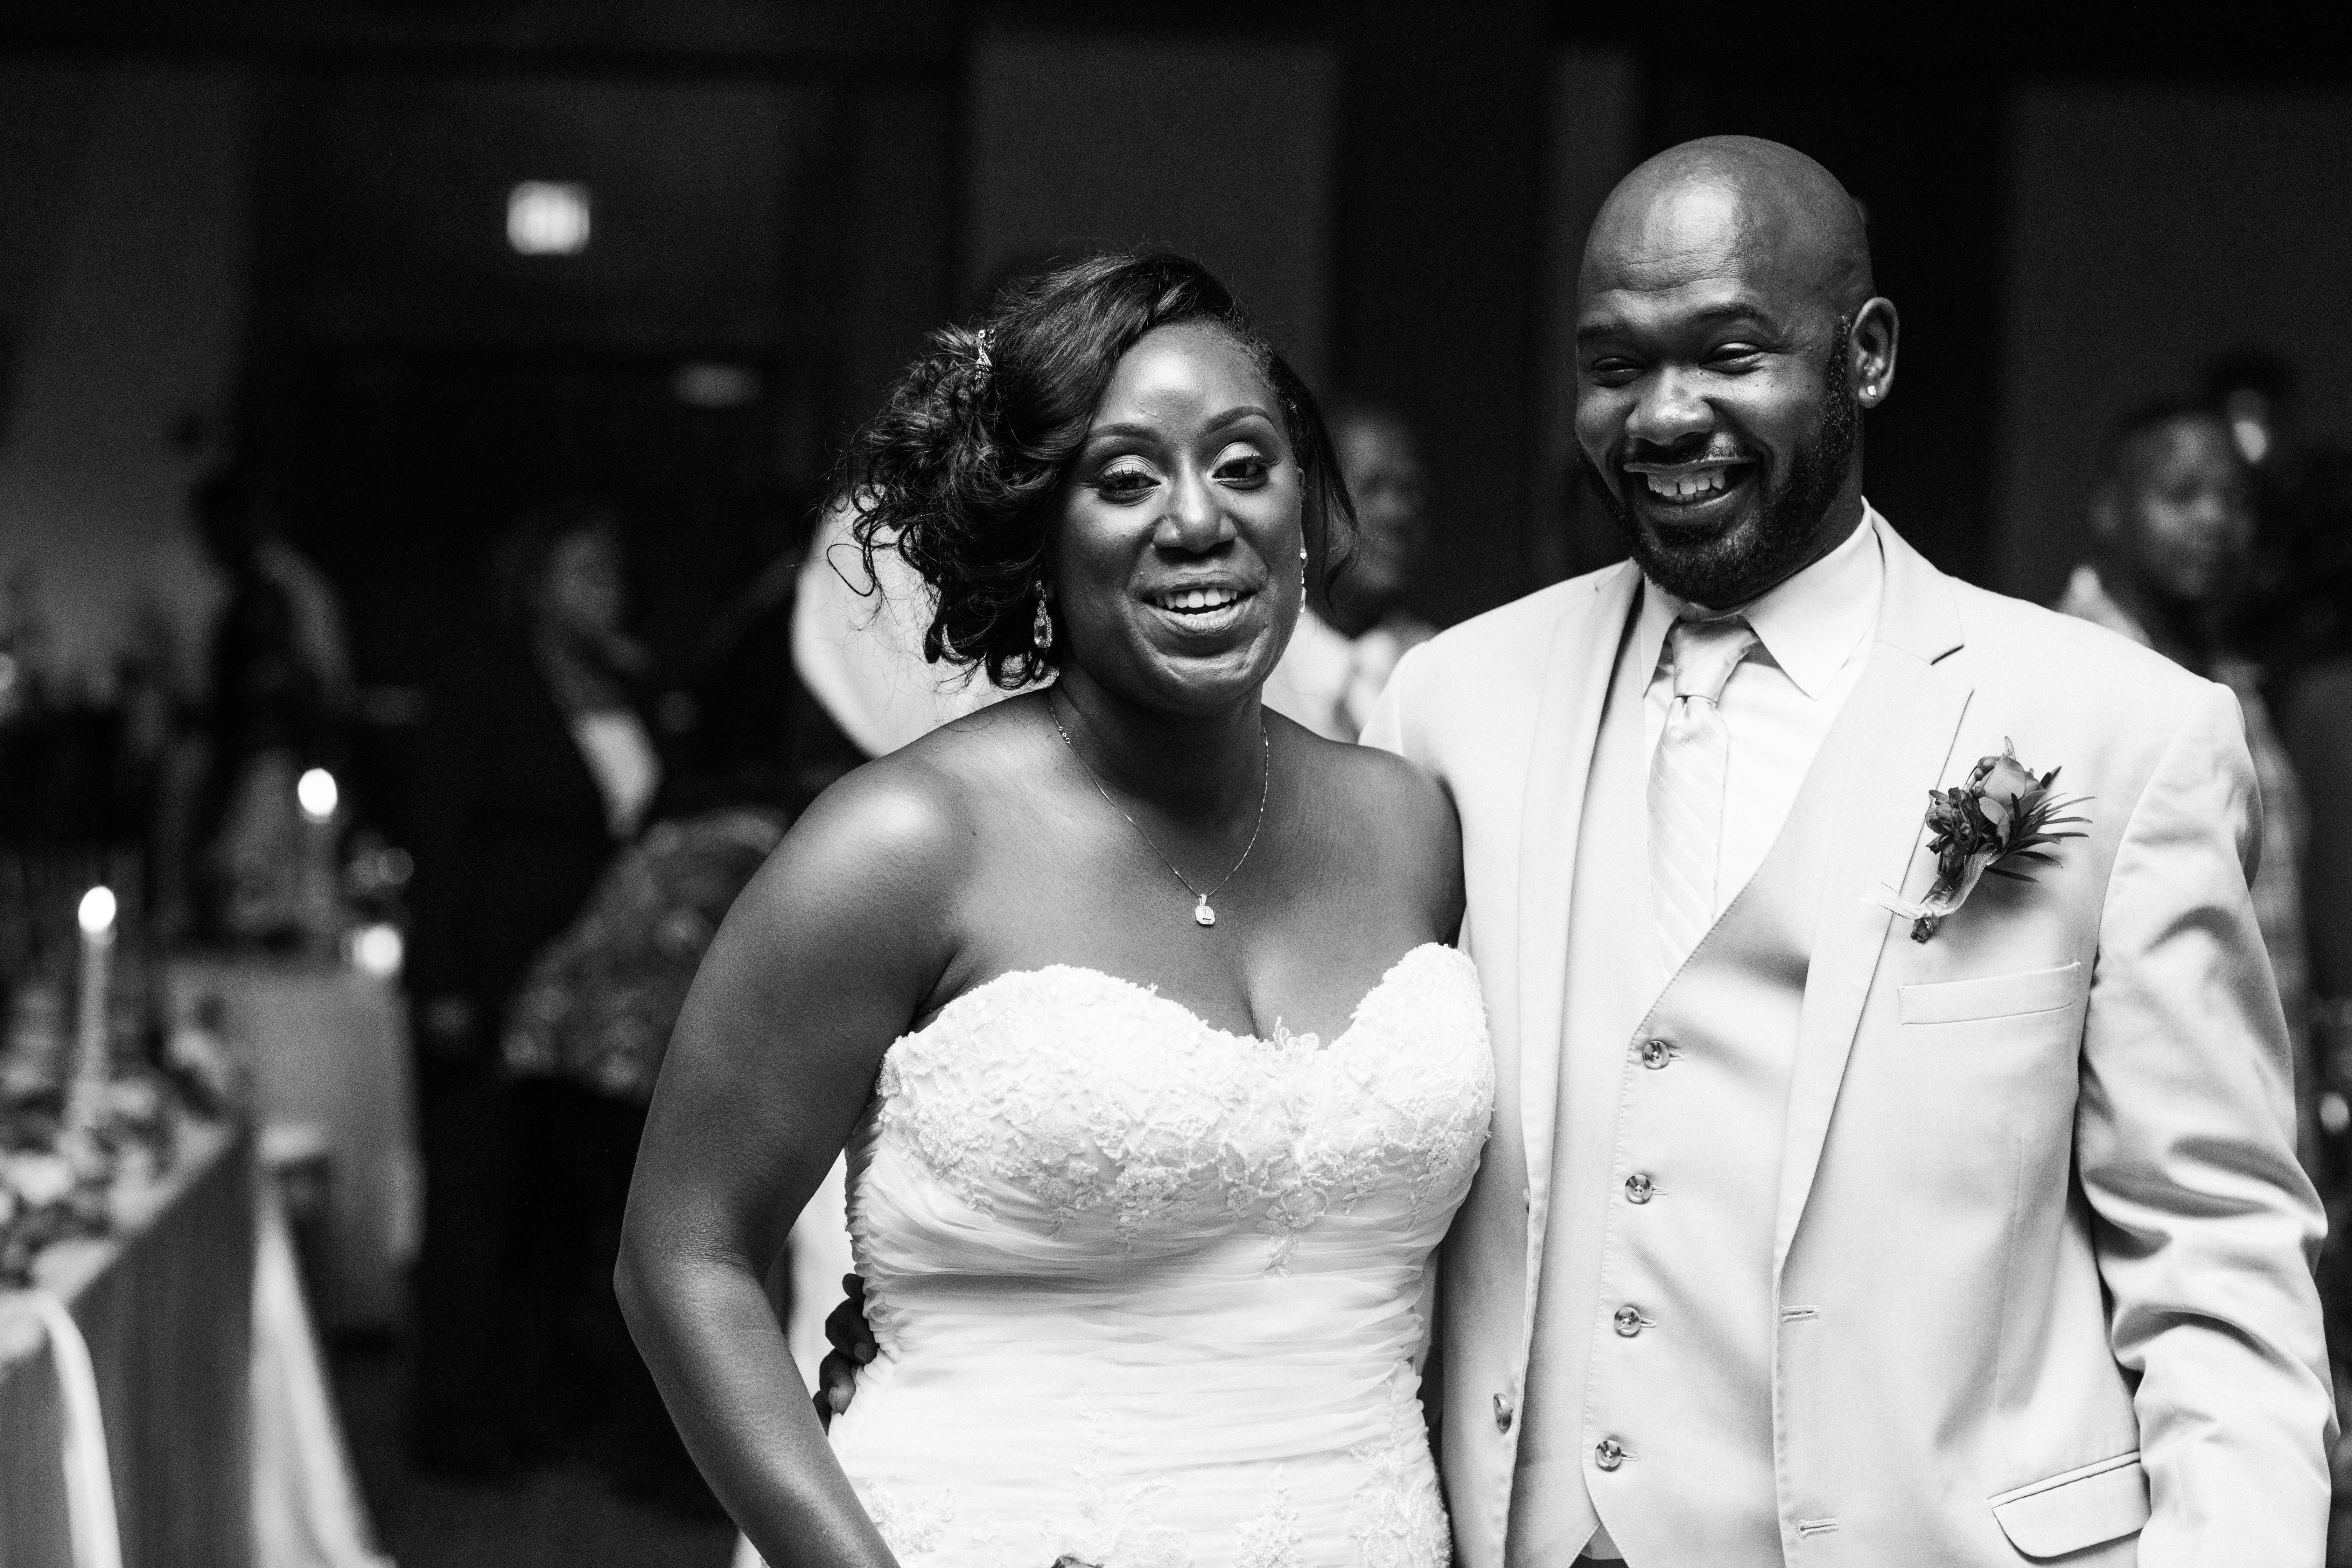 FRANCE_WEDDING_PRATTVILLE_ALABAMA_WEDDING_PHOTOGRAPHY_85-3